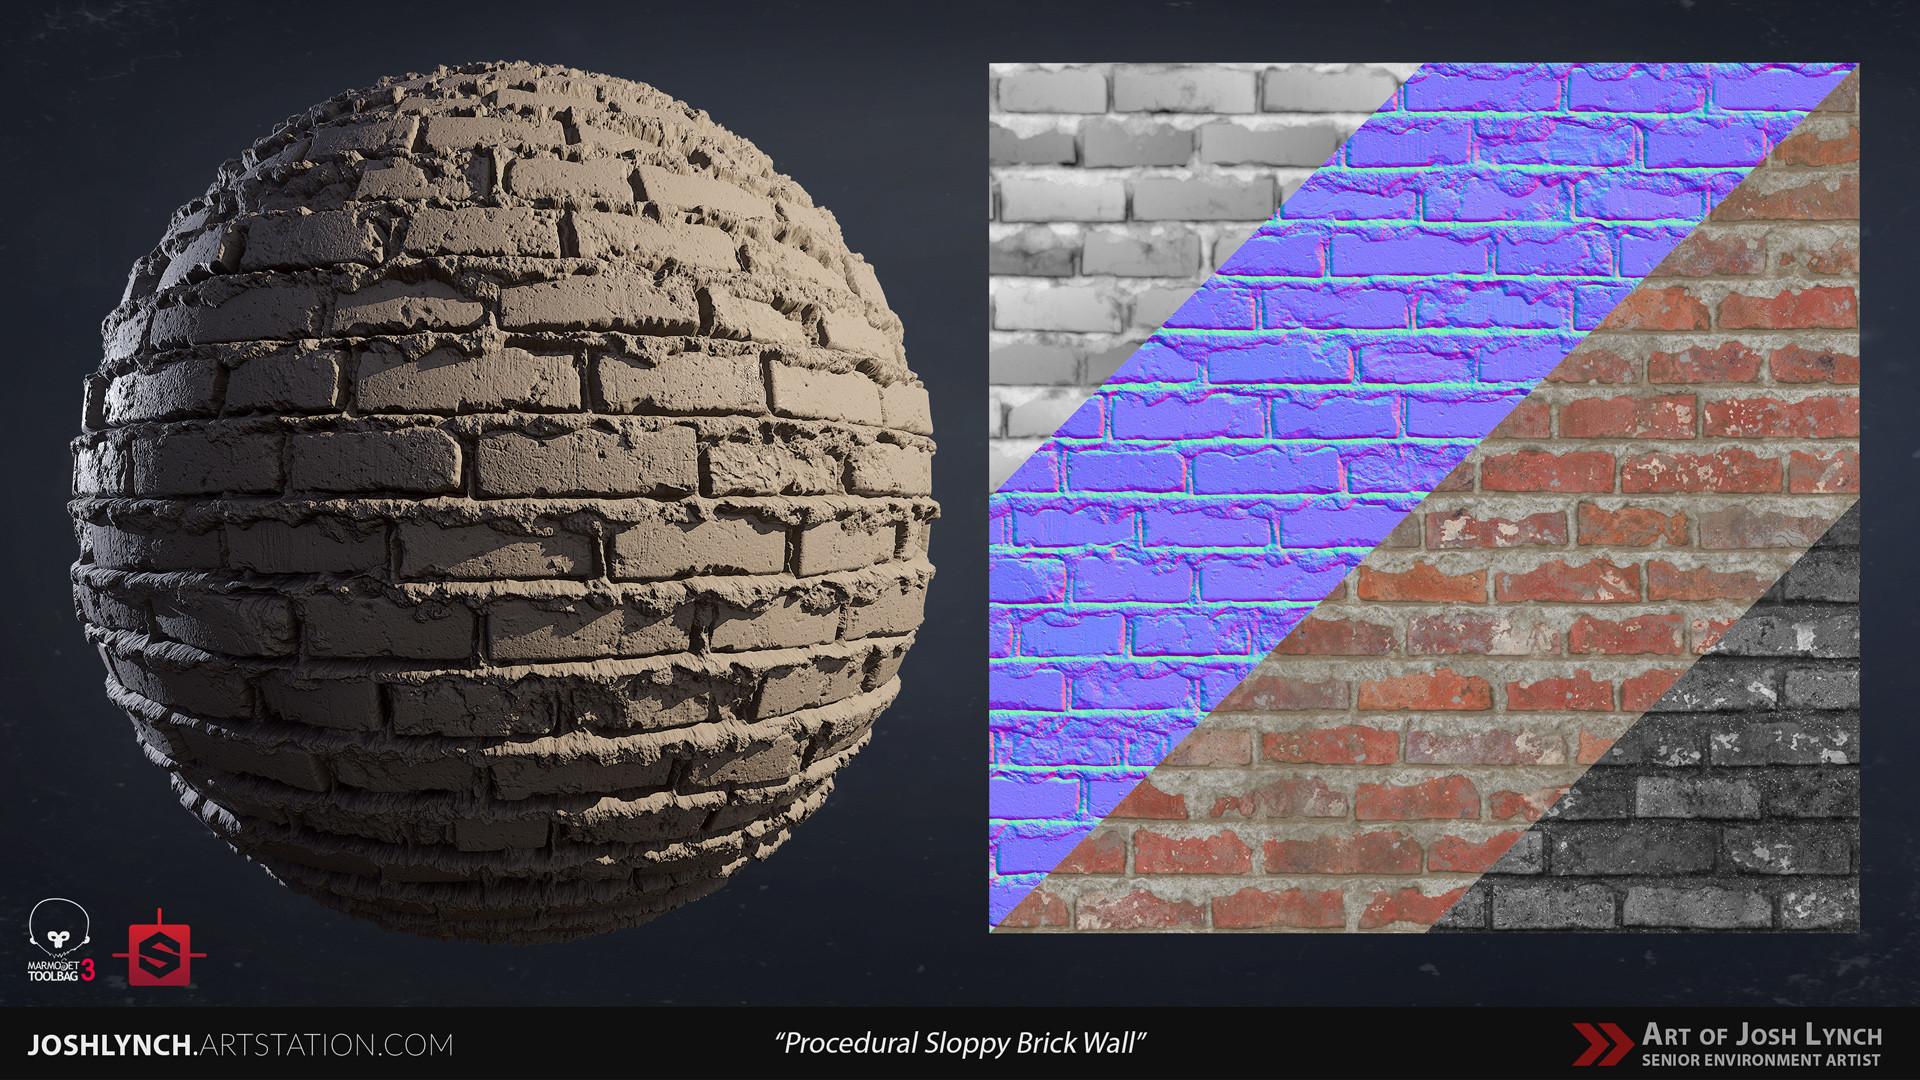 Joshua lynch wall brick sloppy 02 comp sphere 02 gray